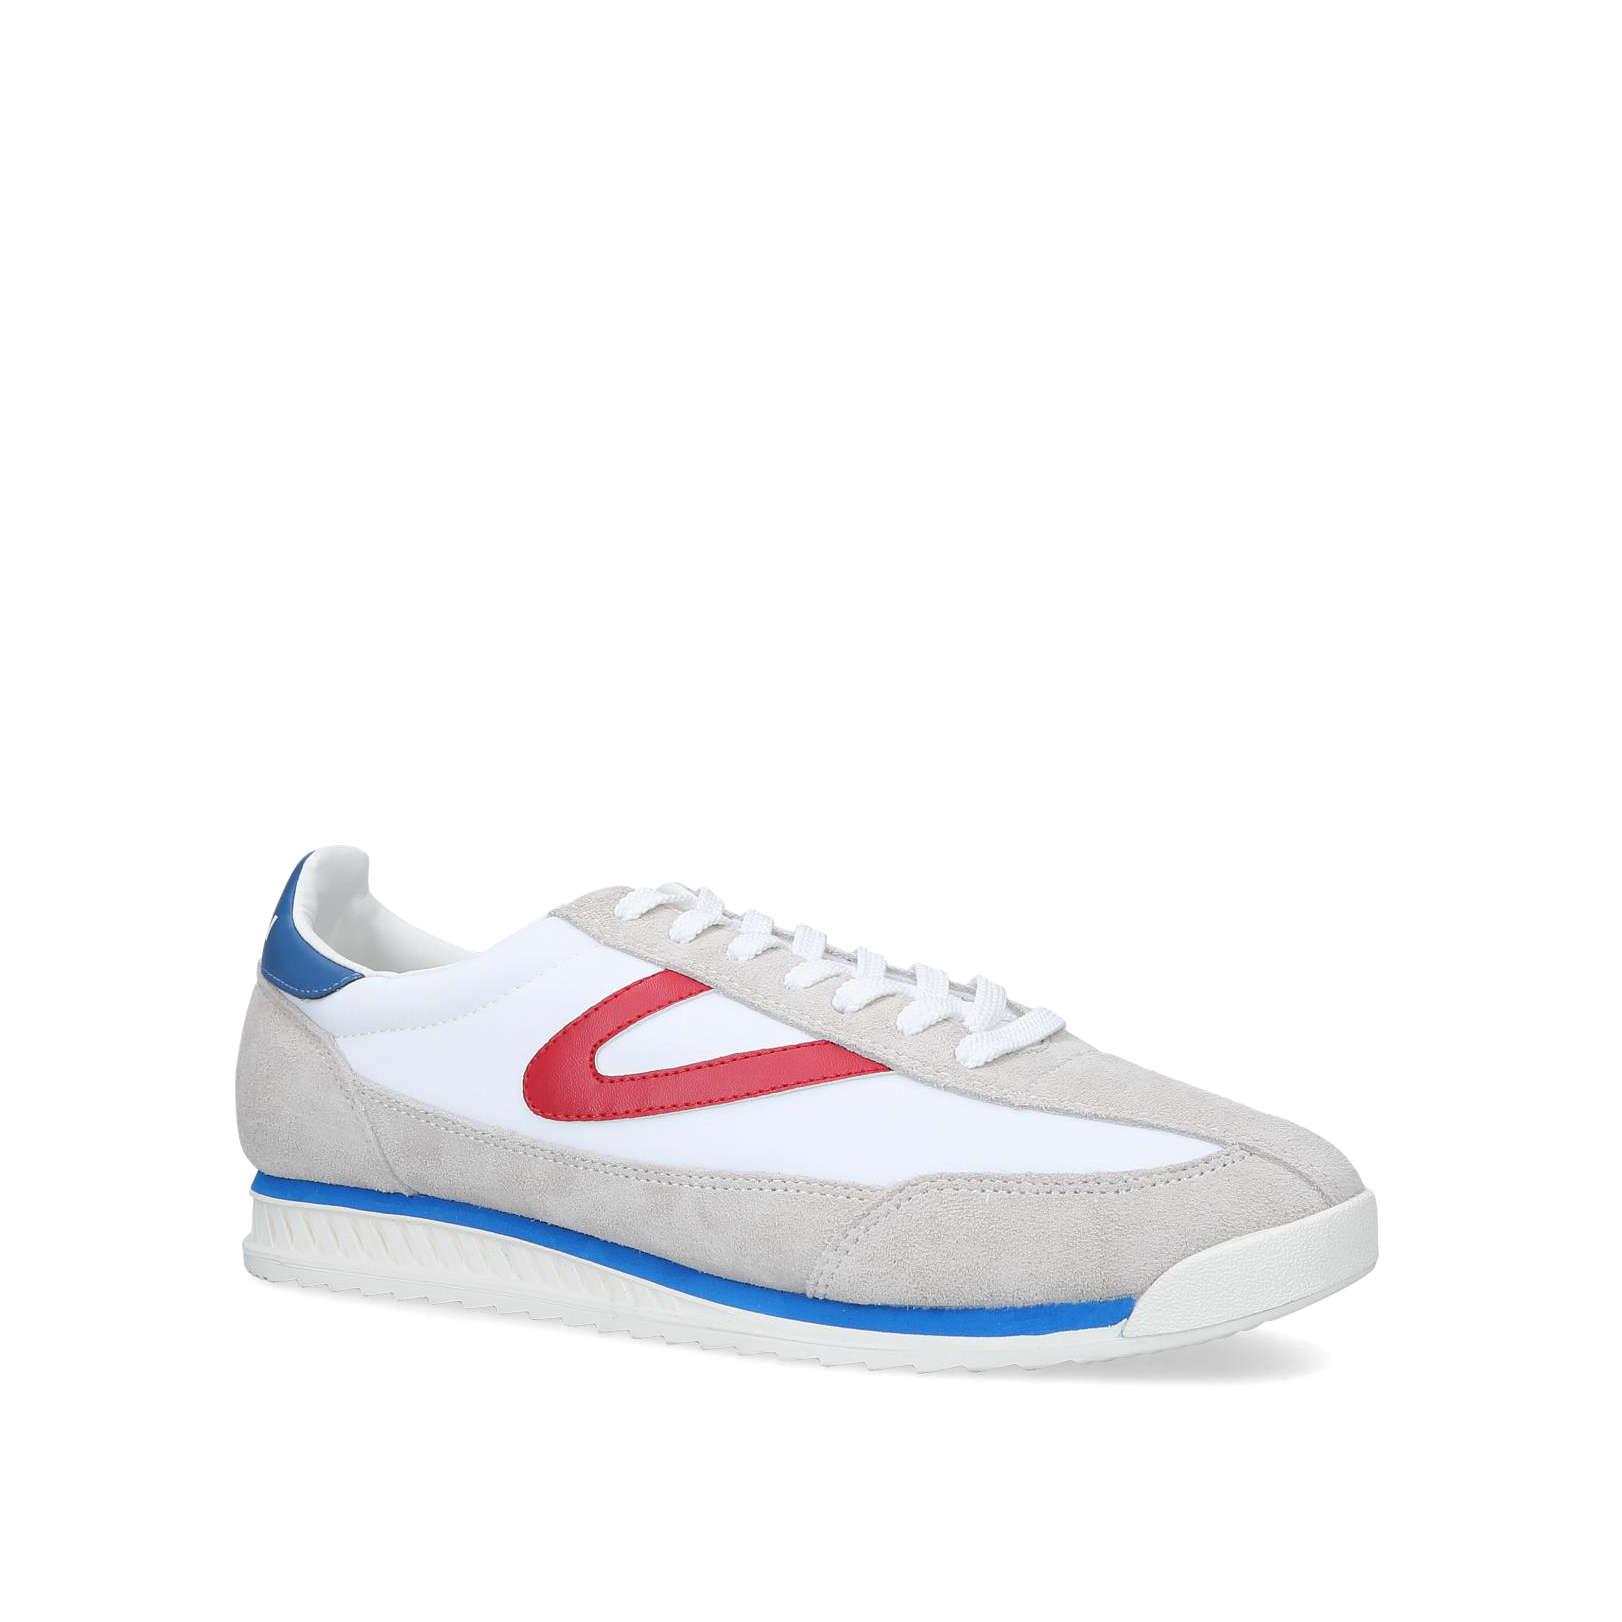 Rawlins 3 - TRETORN Sneakers